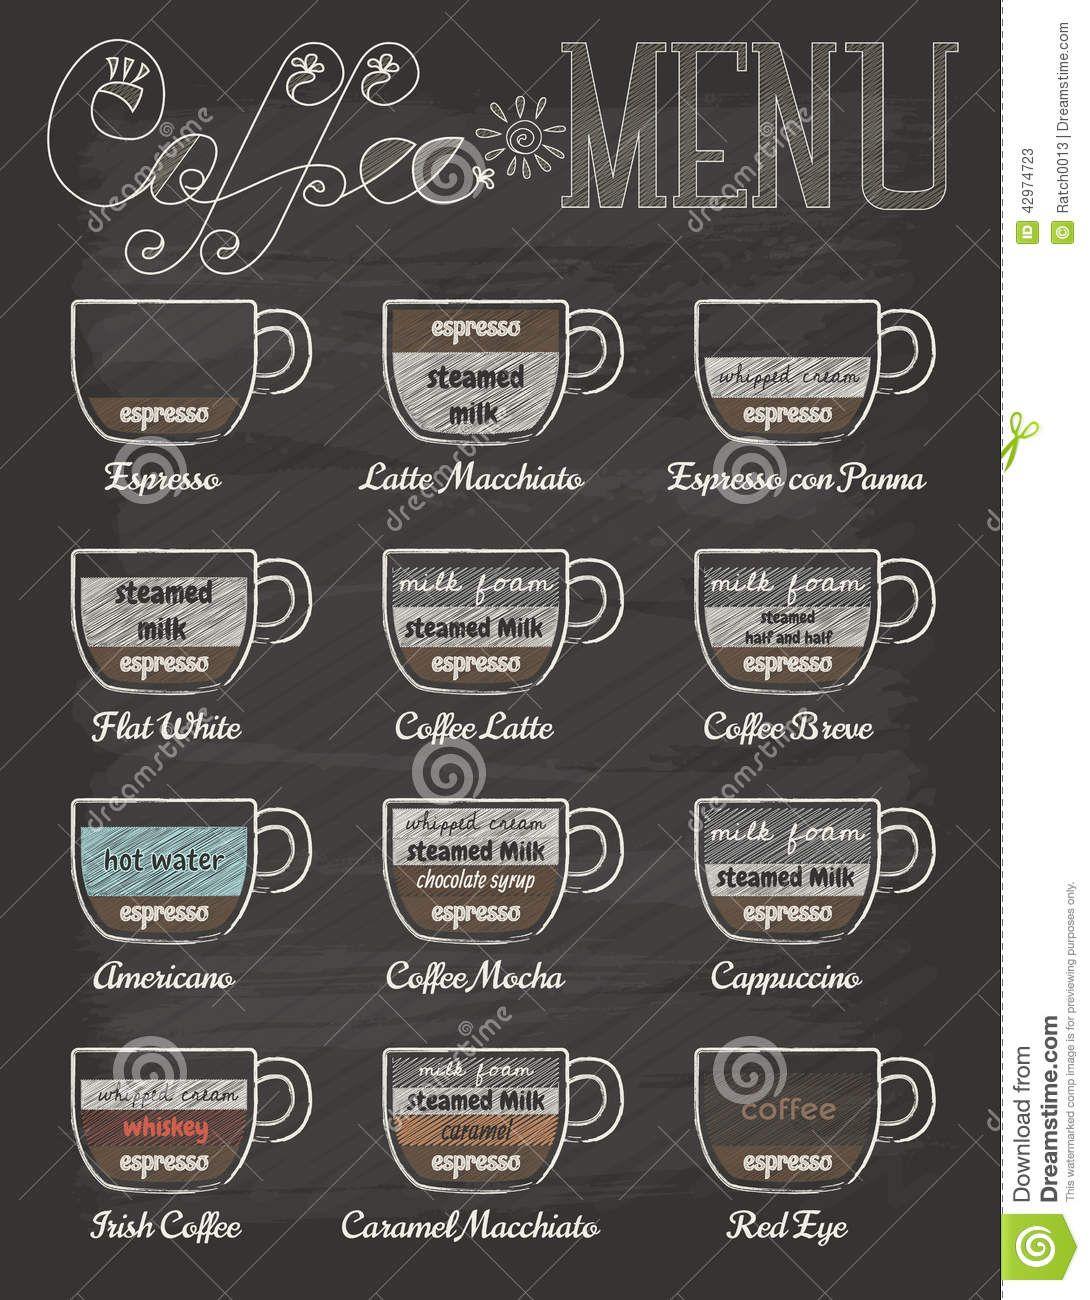 Mod Cafe Menu